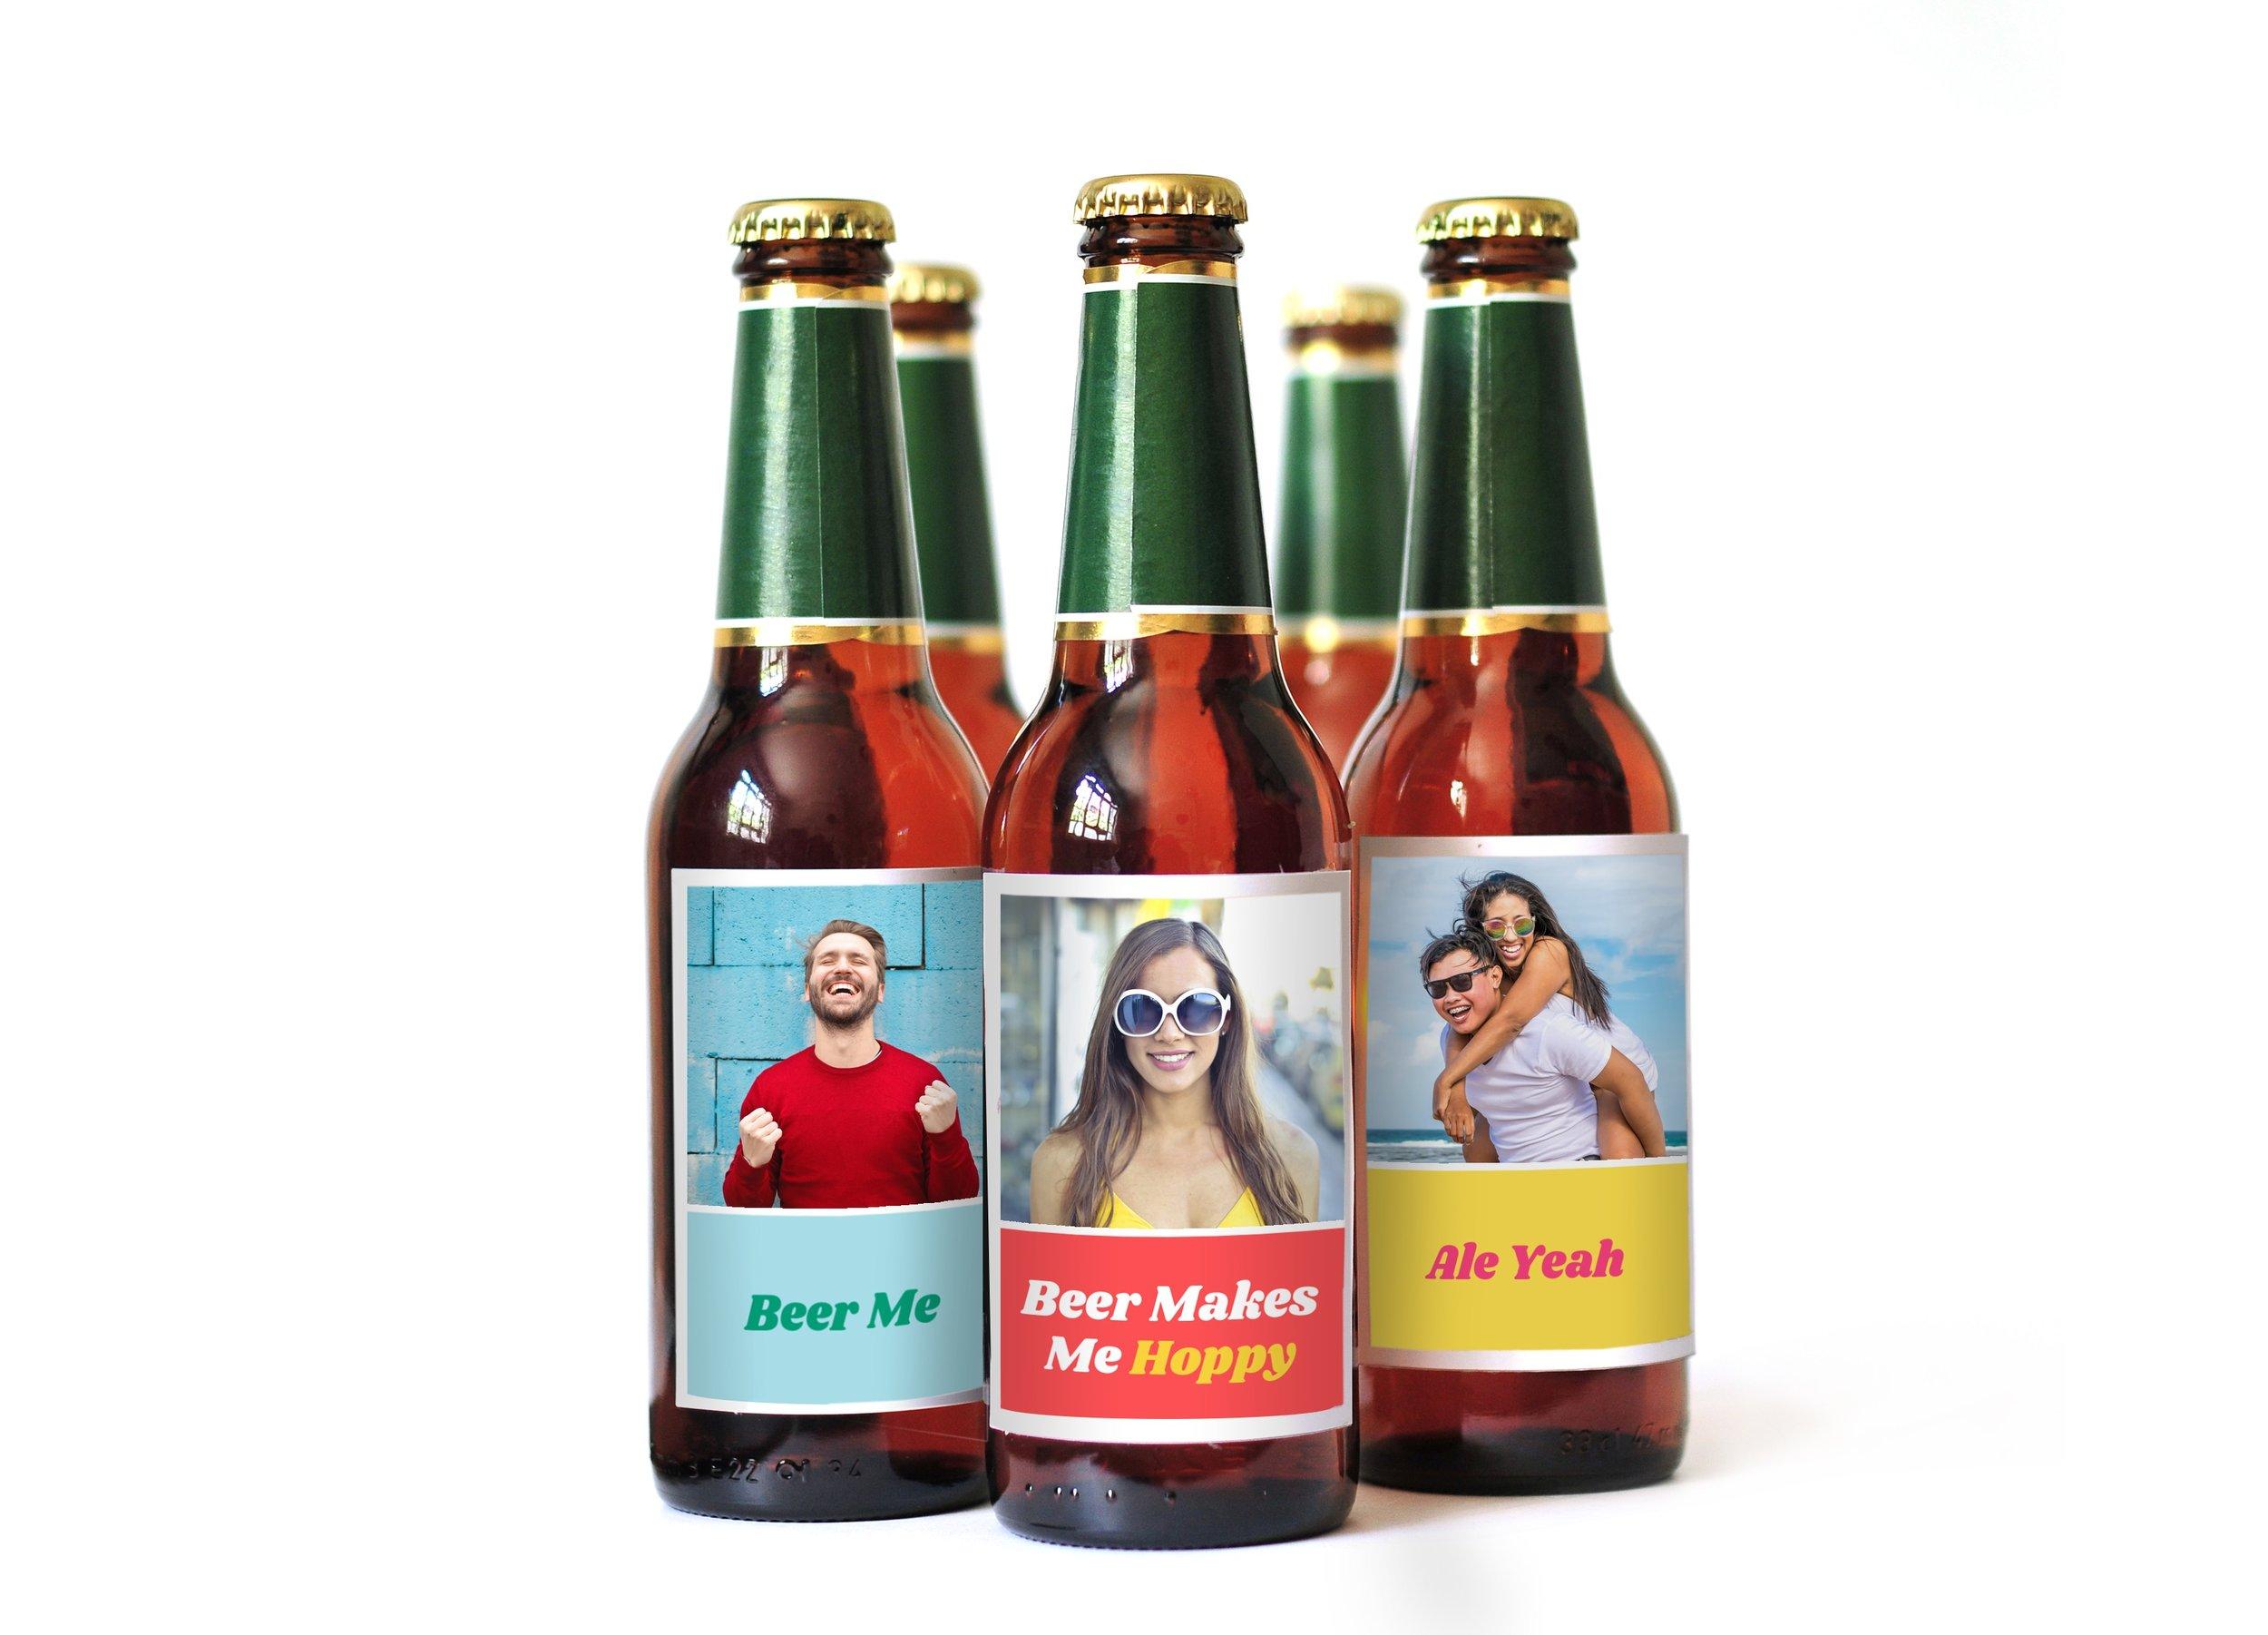 pinhole-punny-beer-labels.jpg